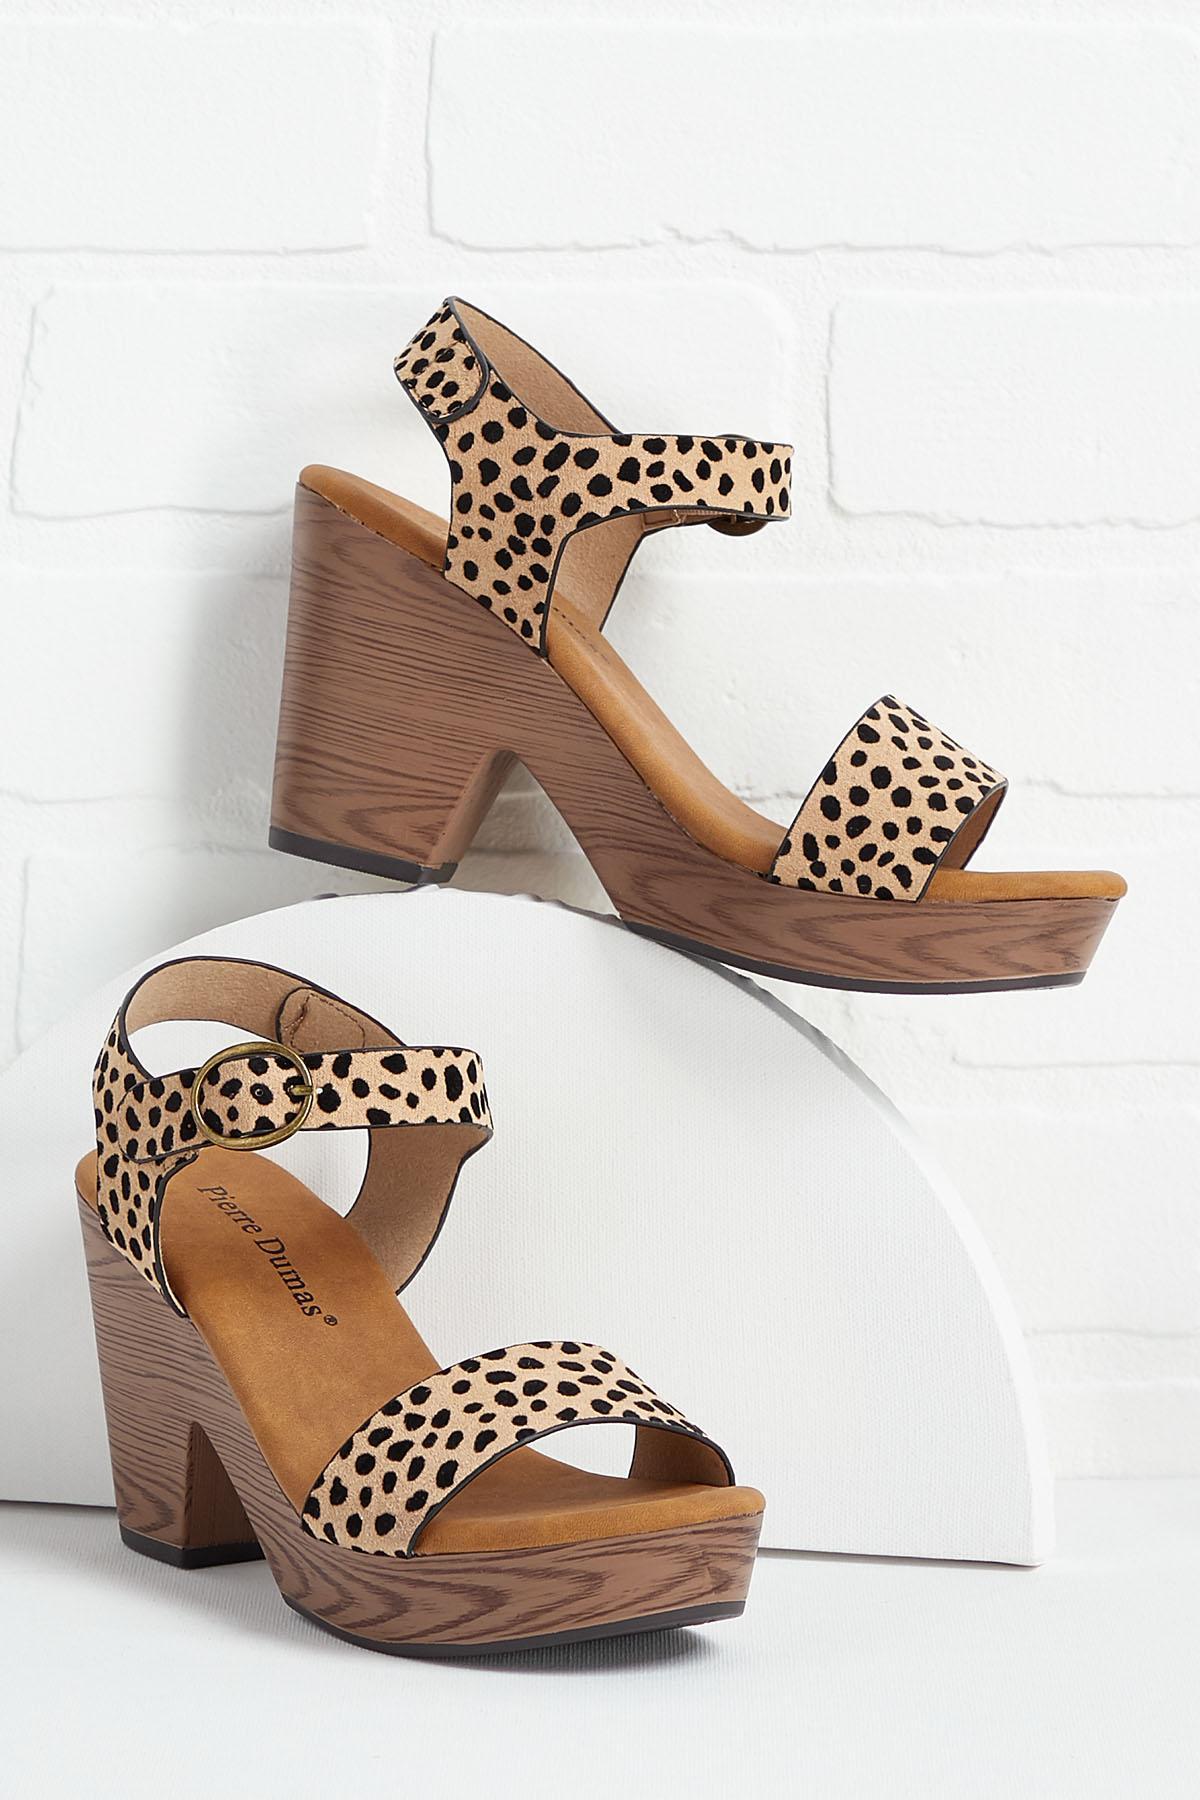 Cheetah Girl Sandals